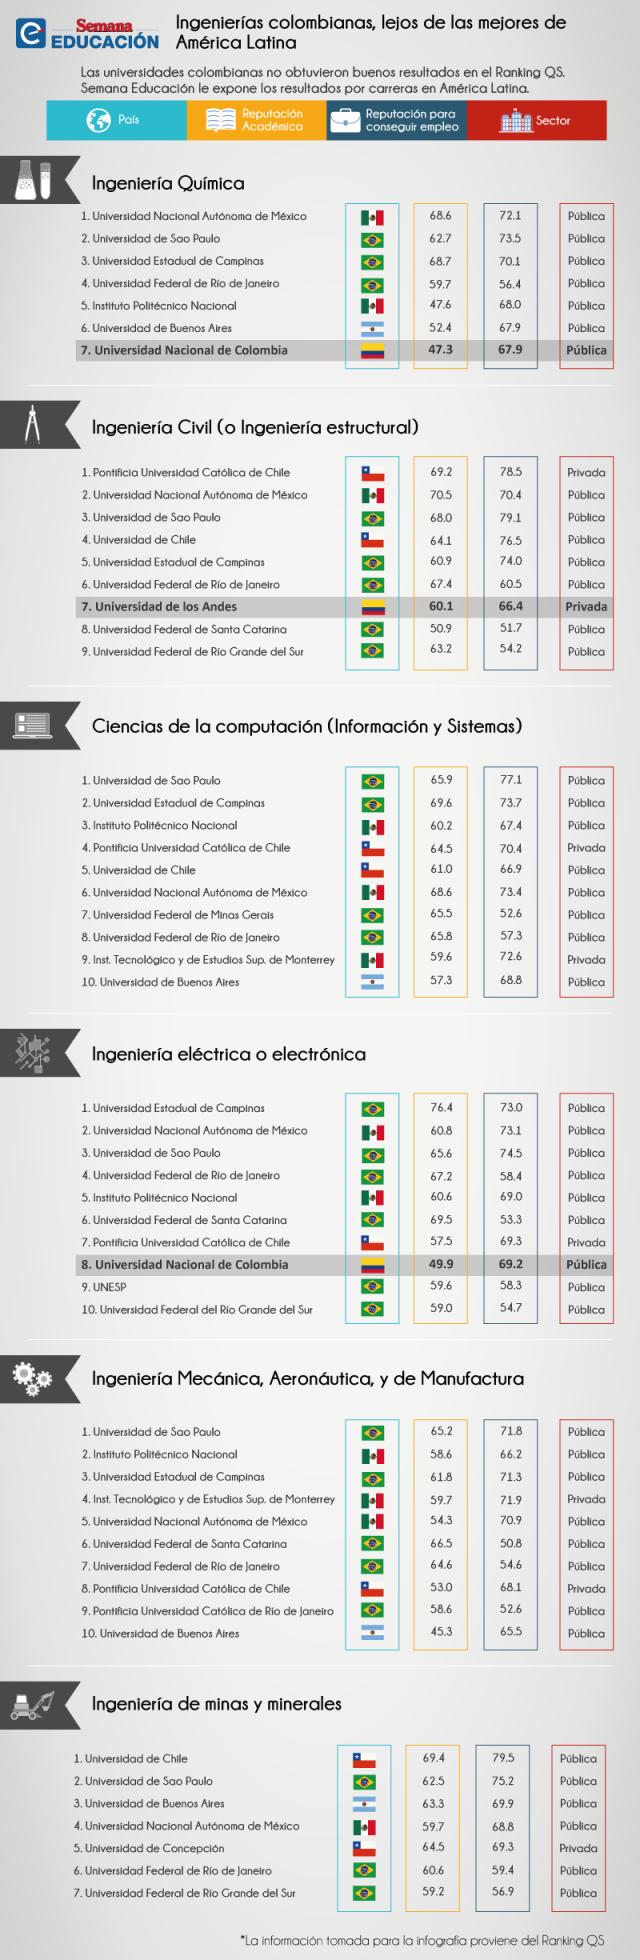 xingenierias_colombianas